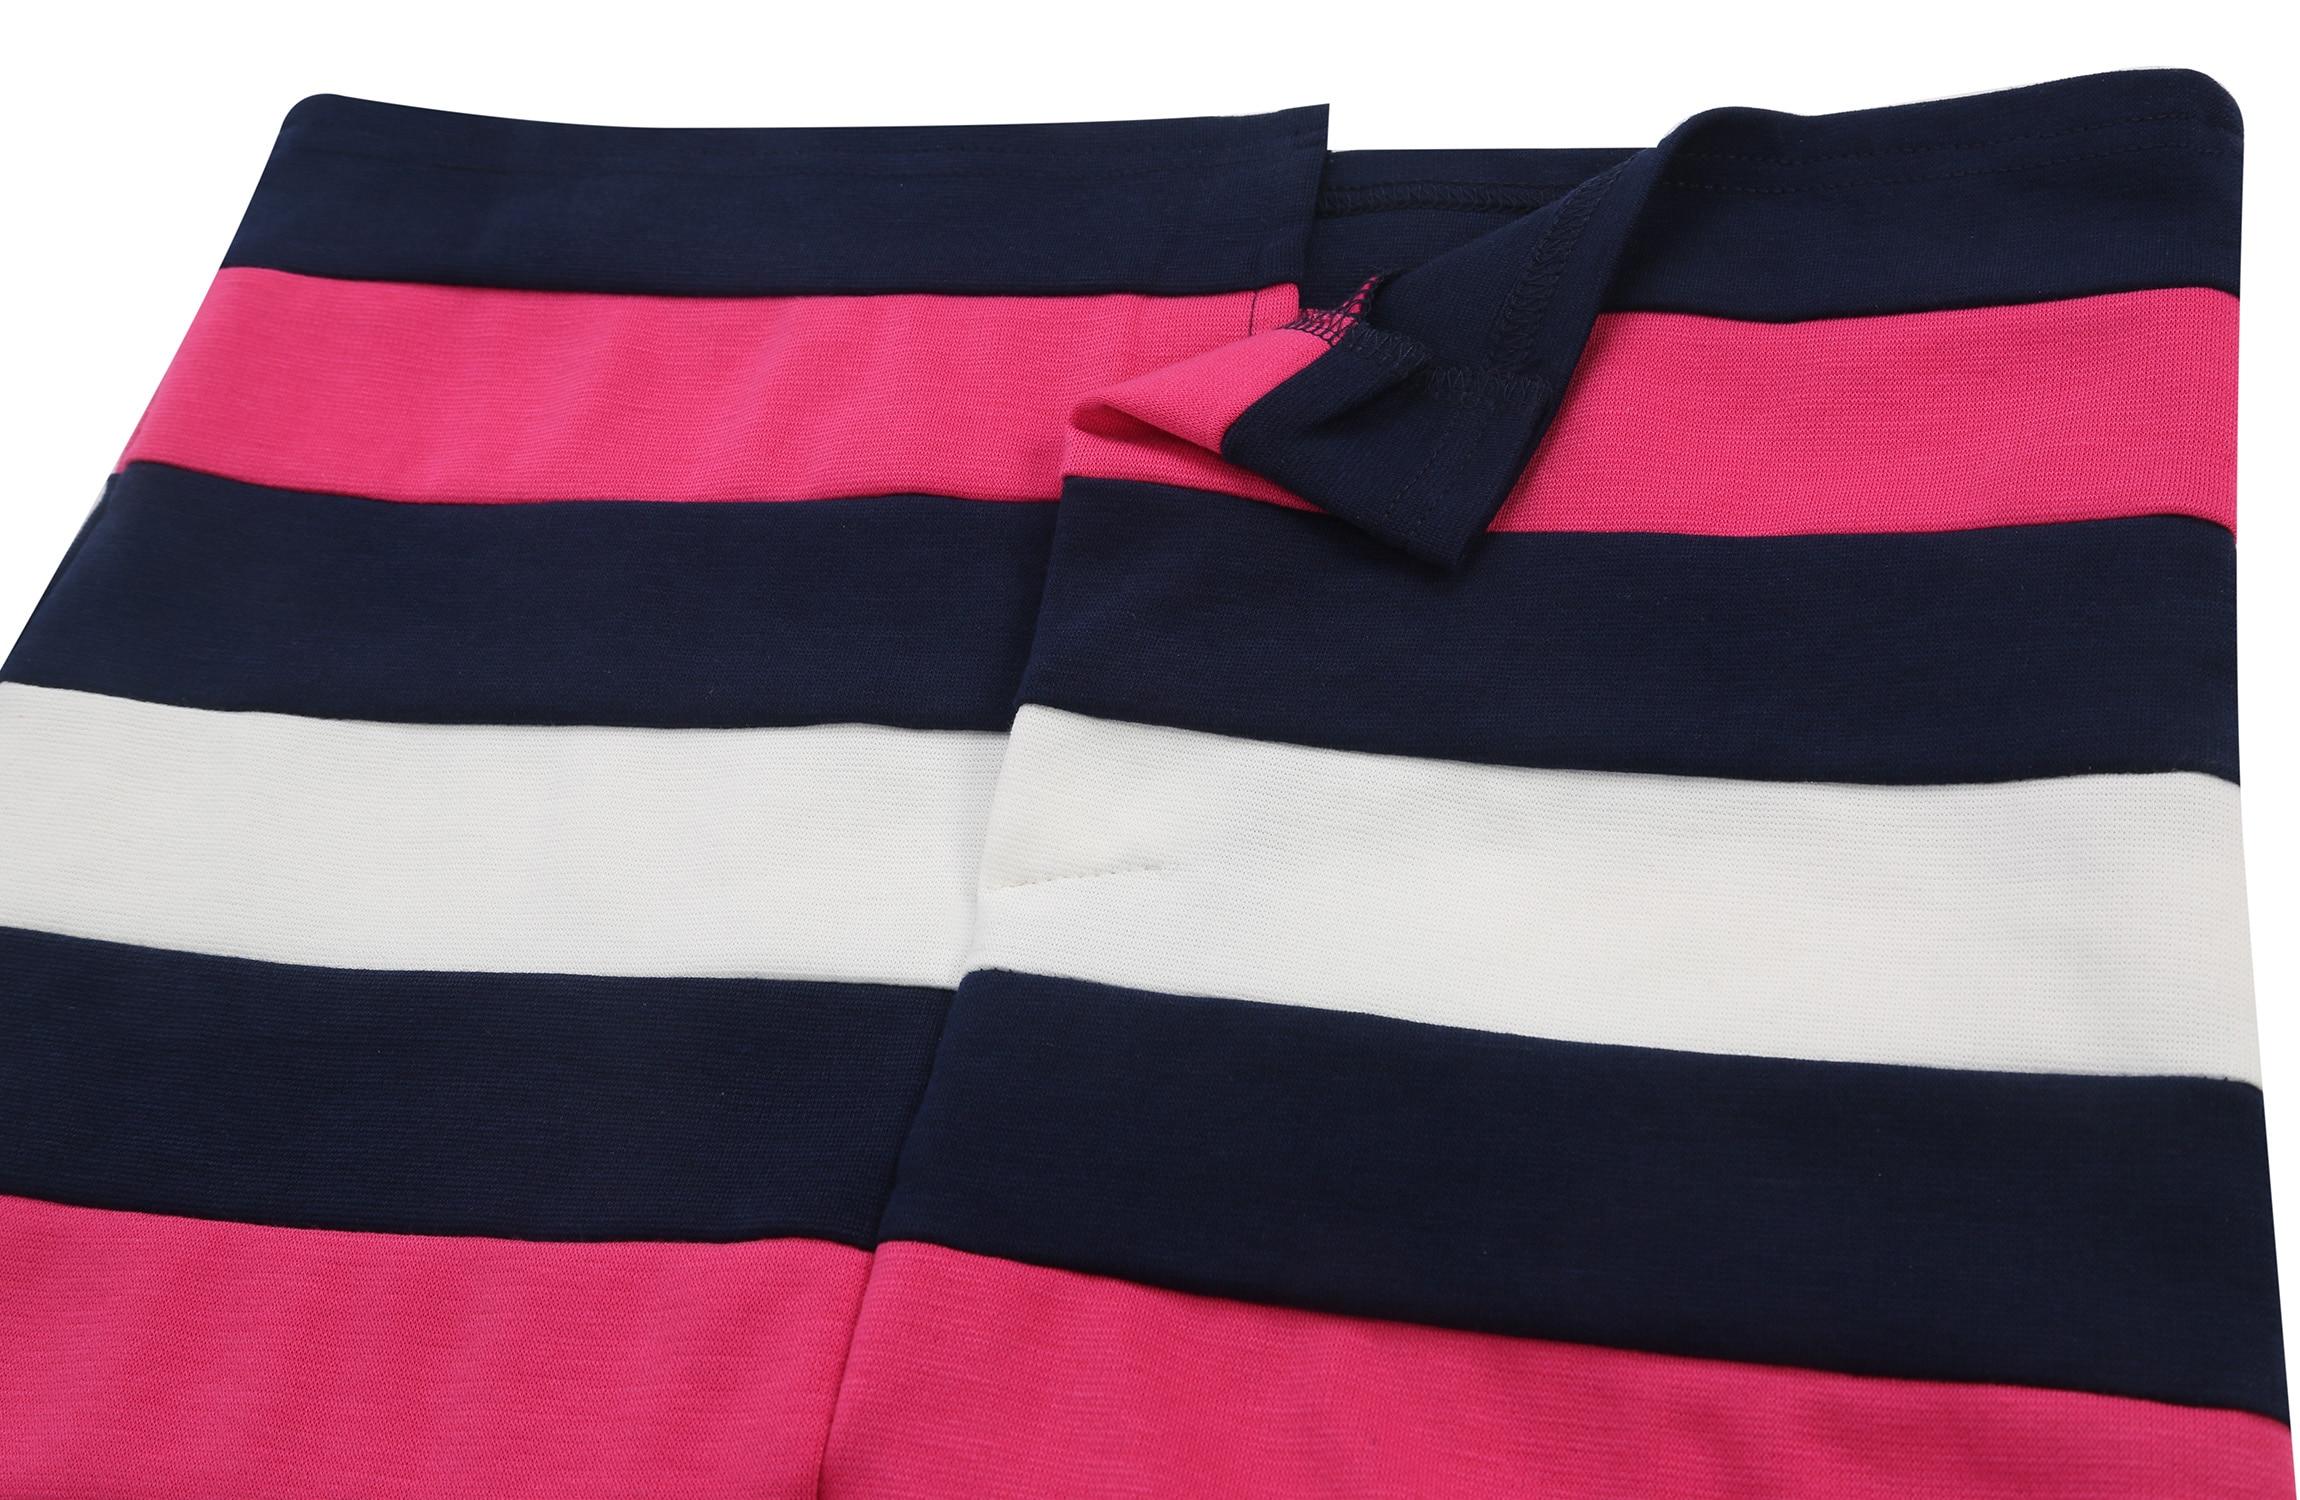 Oxiuly Dunkelblaues Kleid Tunika Frauen Formelle Arbeit Büro Scheide - Damenbekleidung - Foto 6